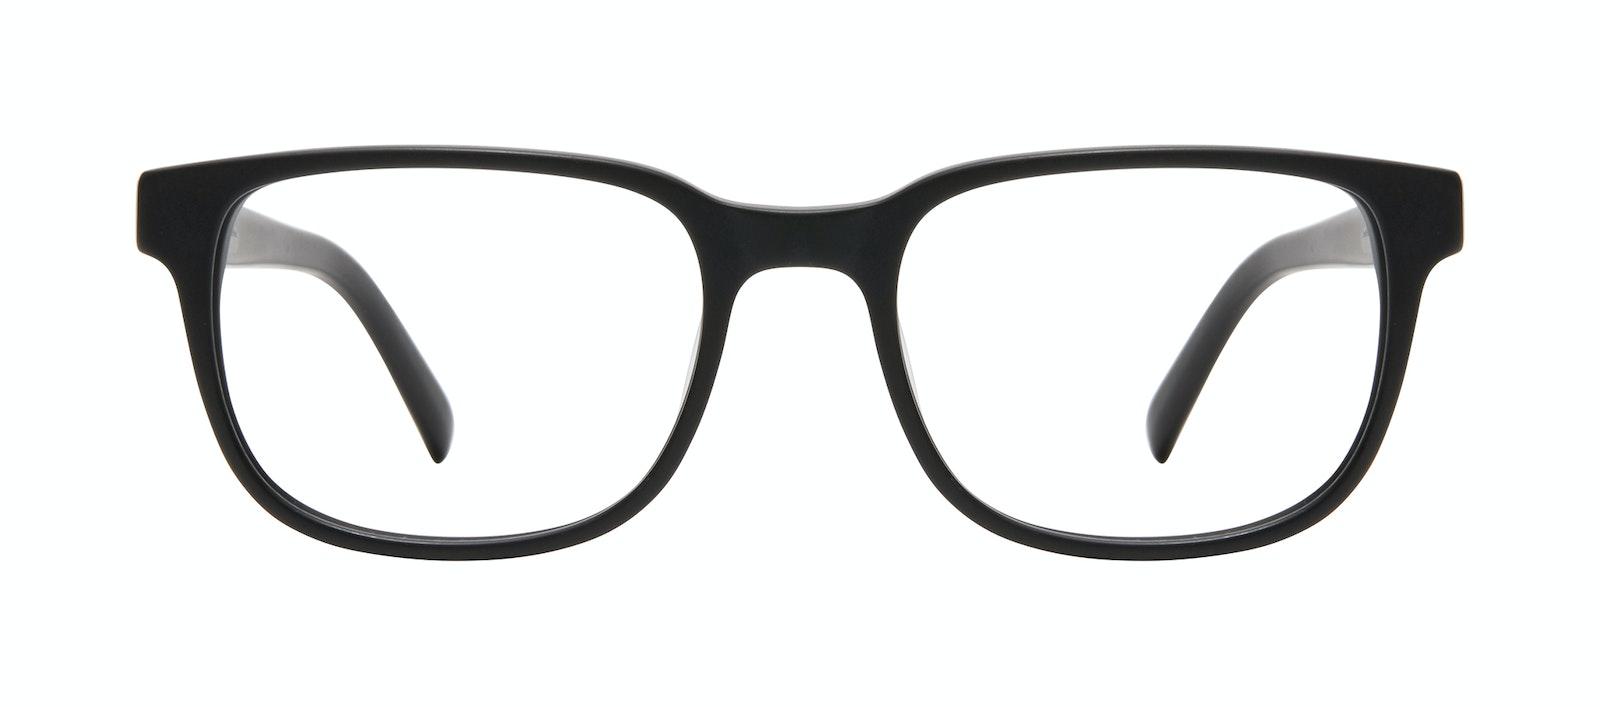 Affordable Fashion Glasses Square Eyeglasses Men Role Black Matte Front